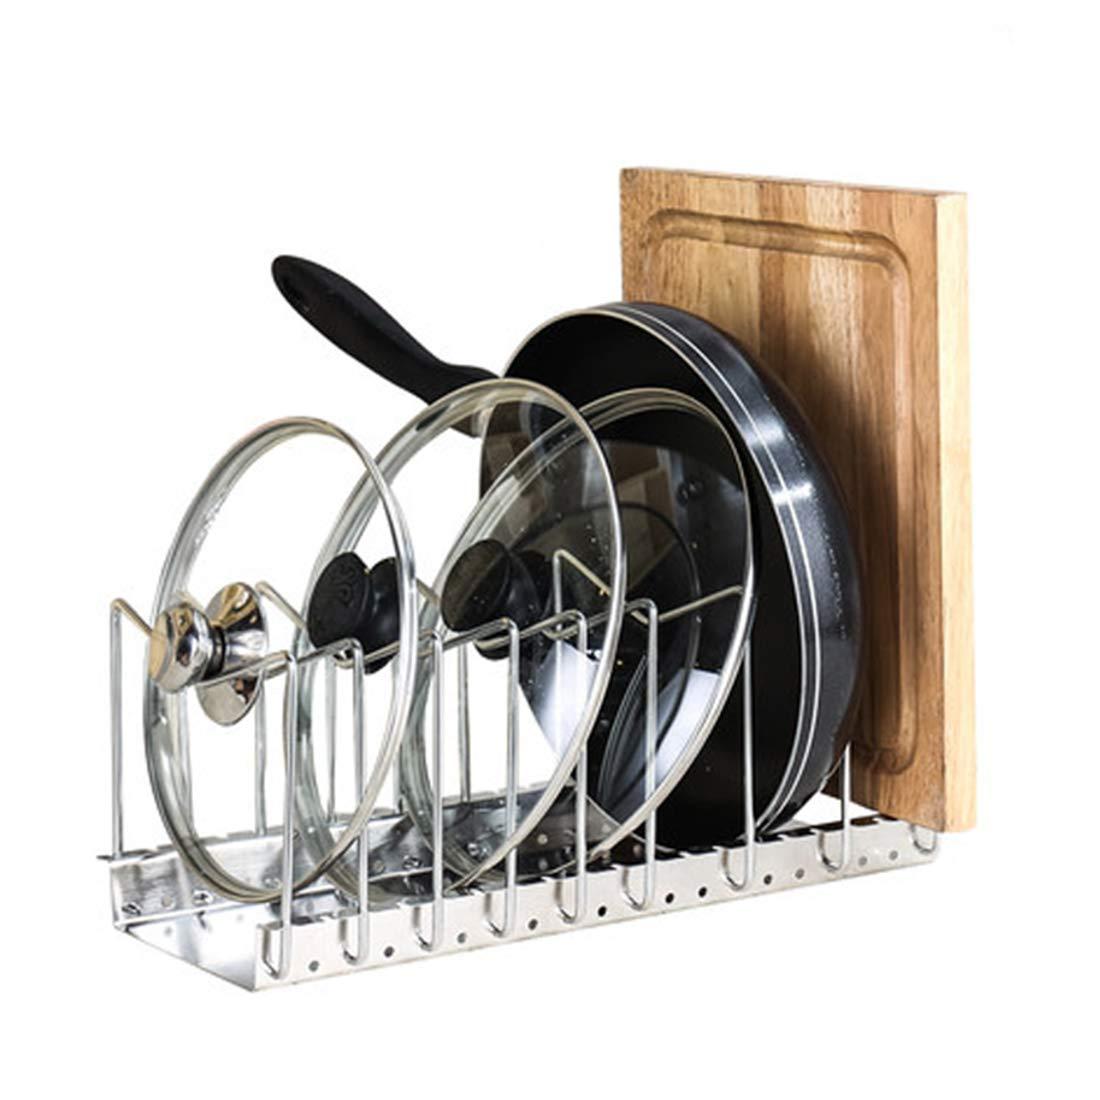 SHOW-WF Height Adjustable Pot Pan Lid Holder Storage Standing Storage Cookware Holders Kitchen Organiser Rack,C 40X18cm